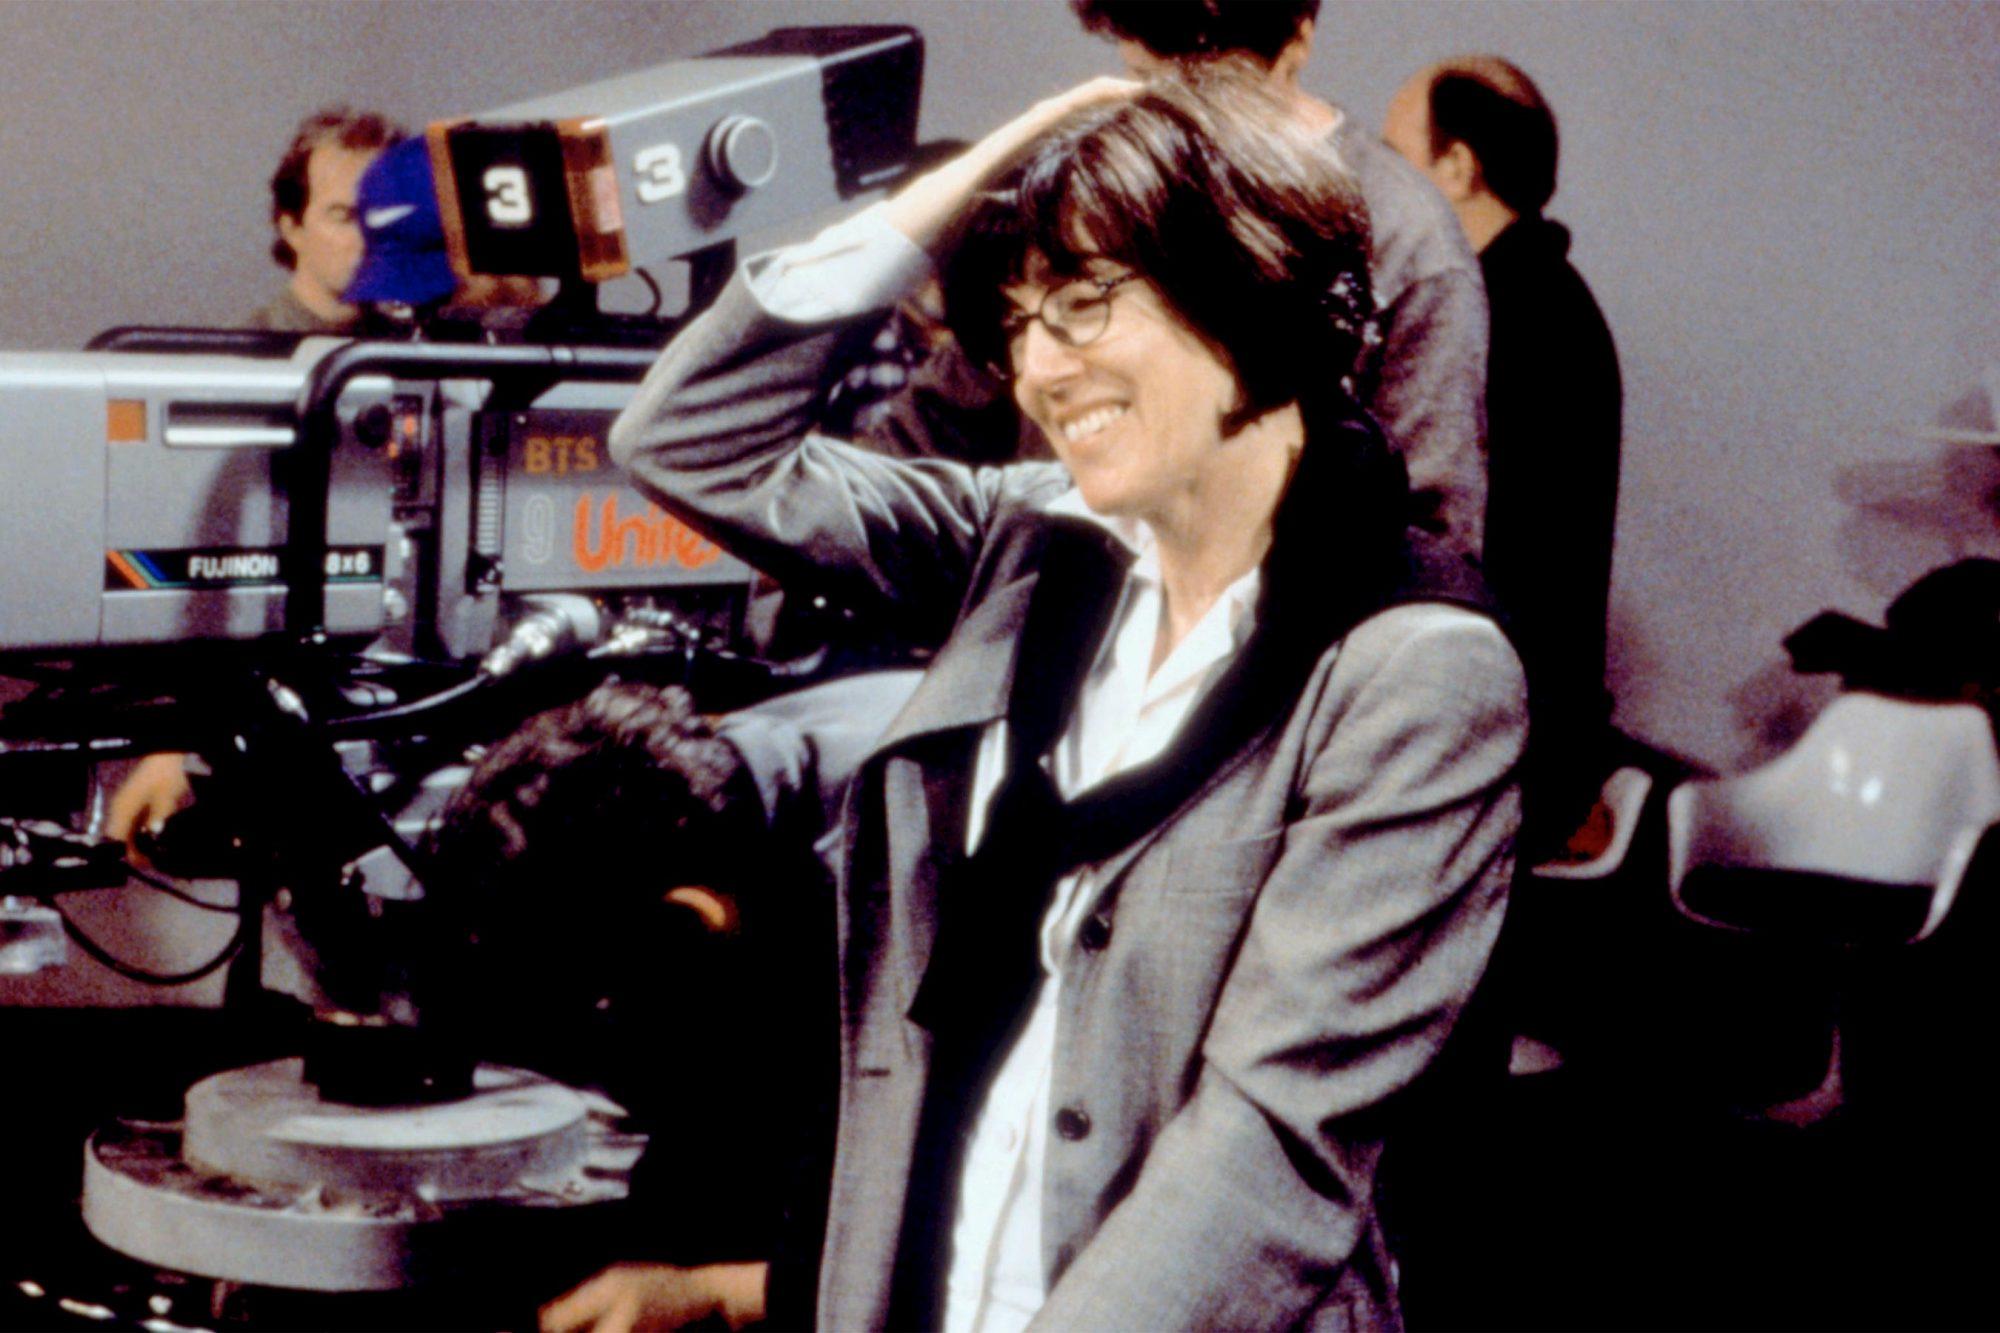 YOU'VE GOT MAIL, Director Nora Ephron, on set, 1998. (c) Warner Bros./ Courtesy: Everett Collection.